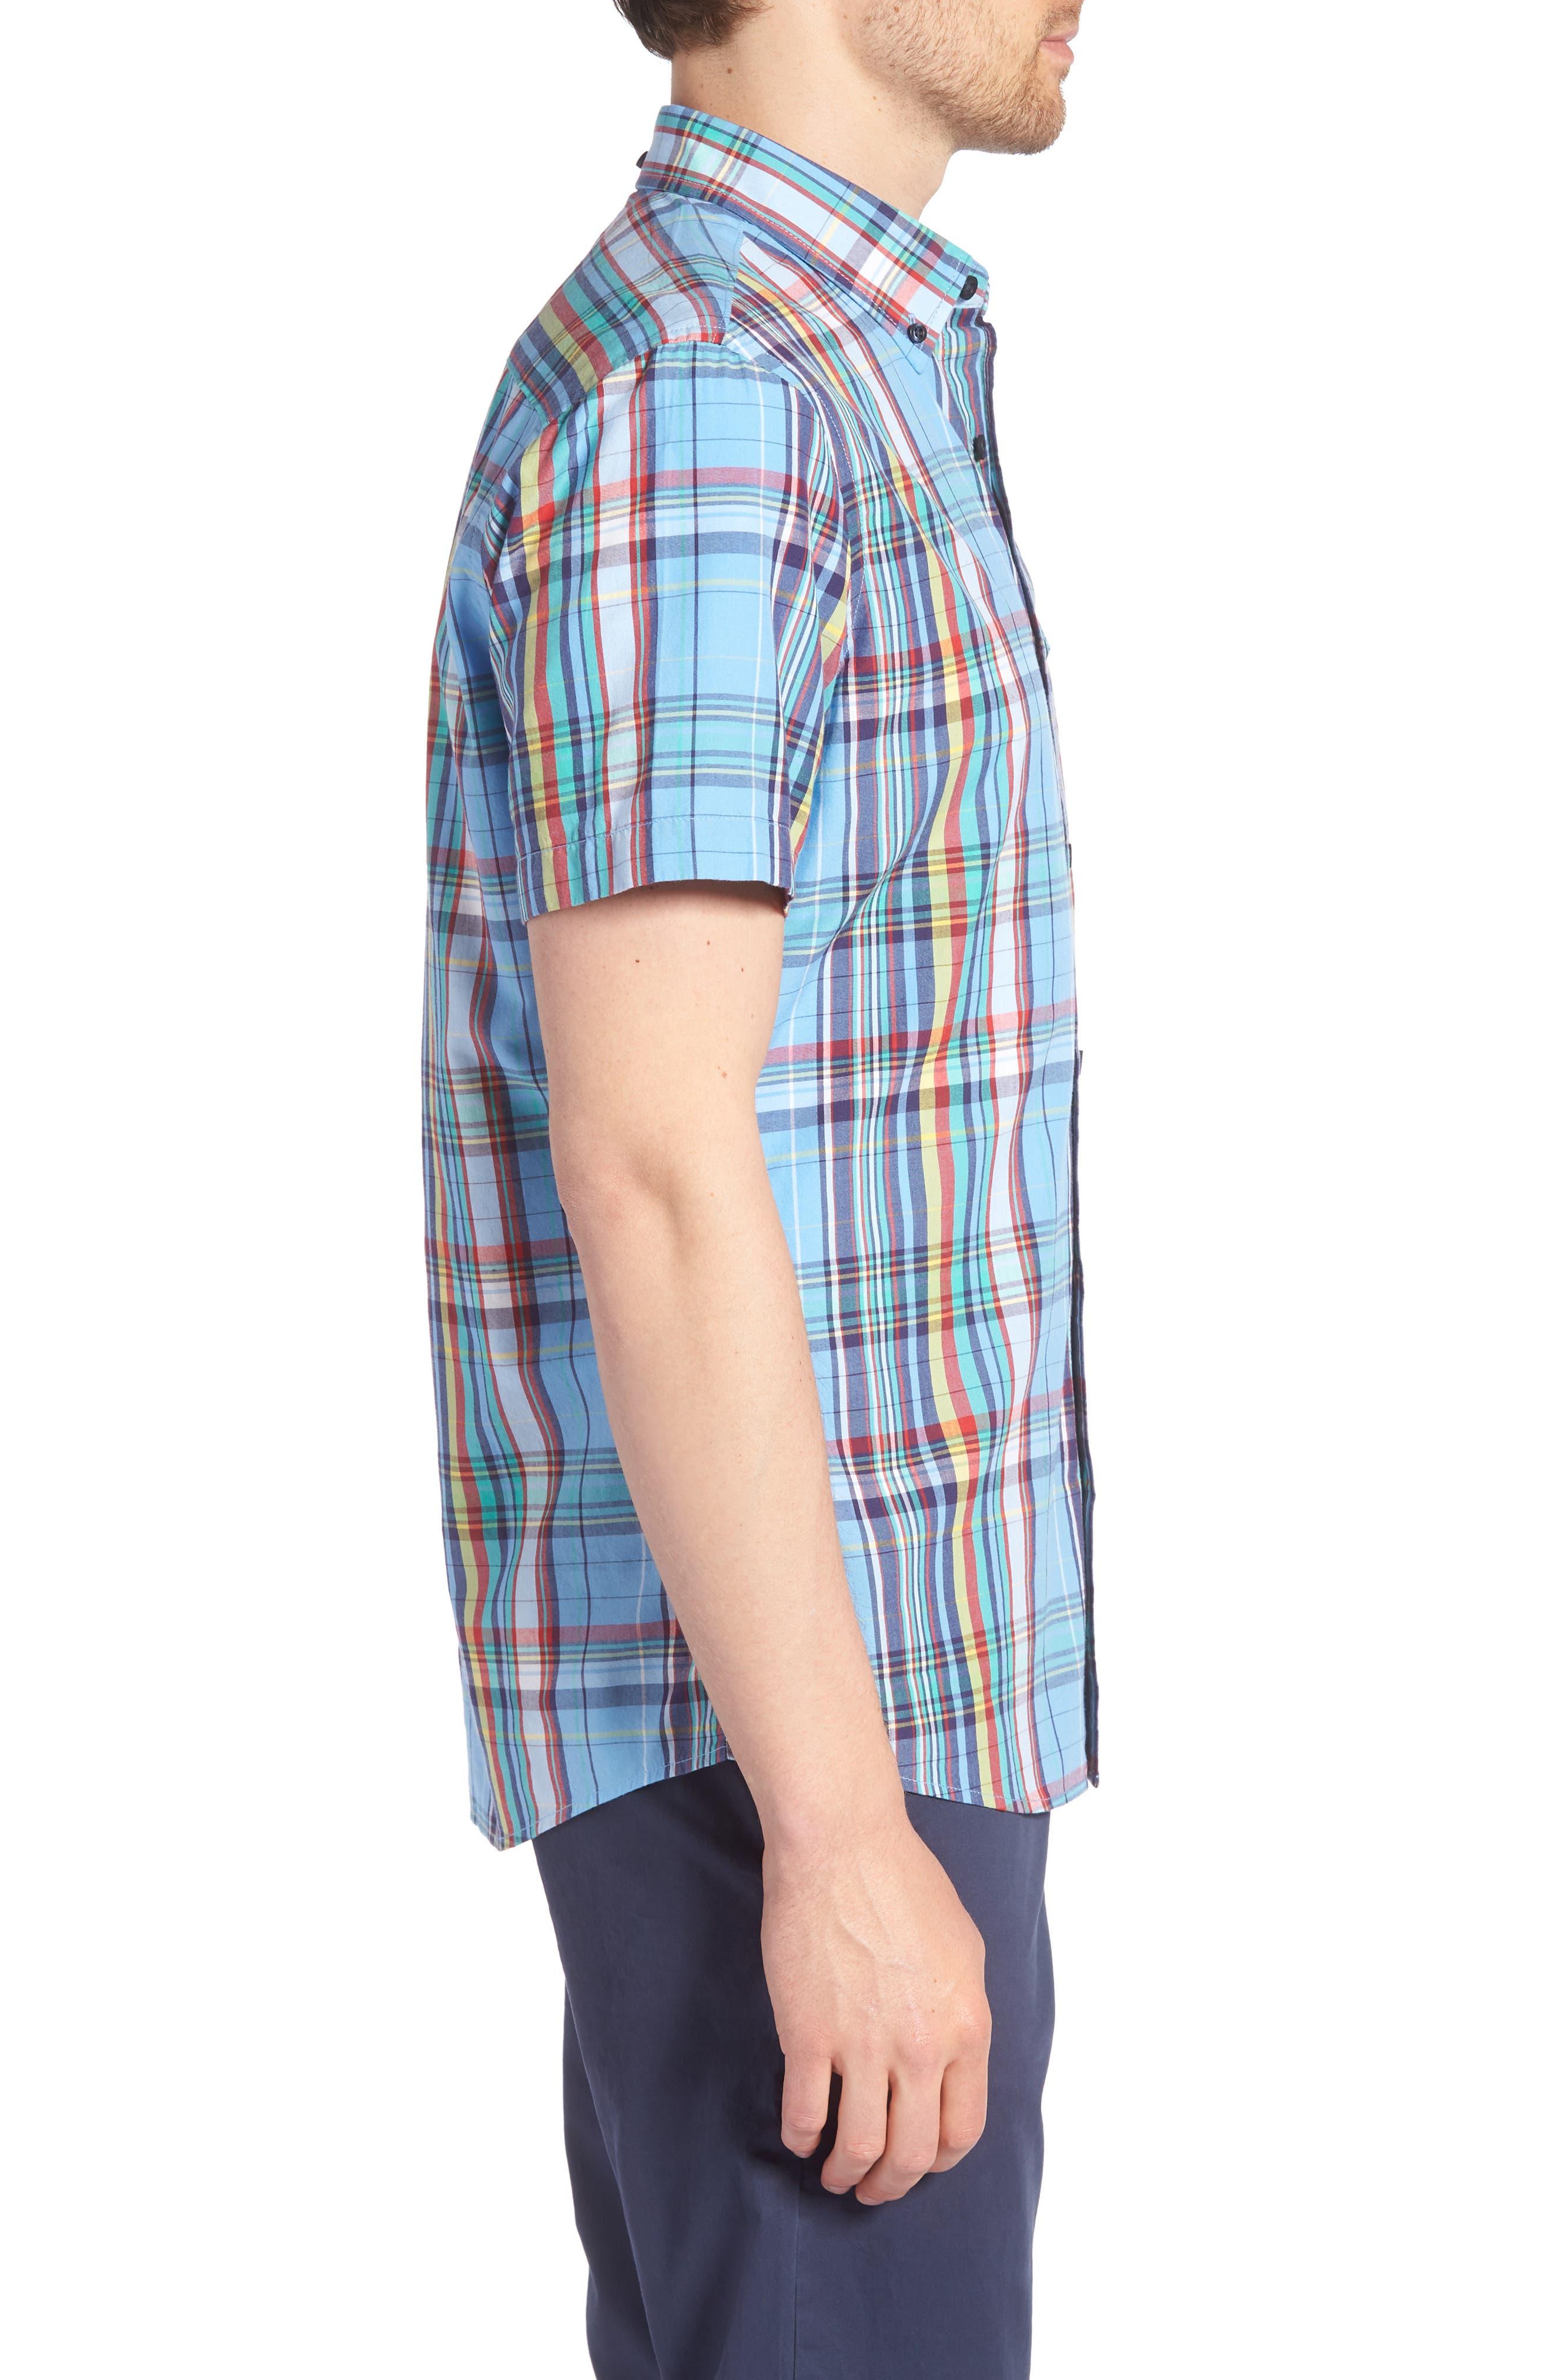 Ivy Trim Fit Madras Plaid Sport Shirt,                             Alternate thumbnail 4, color,                             Blue Chambray Multi Plaid